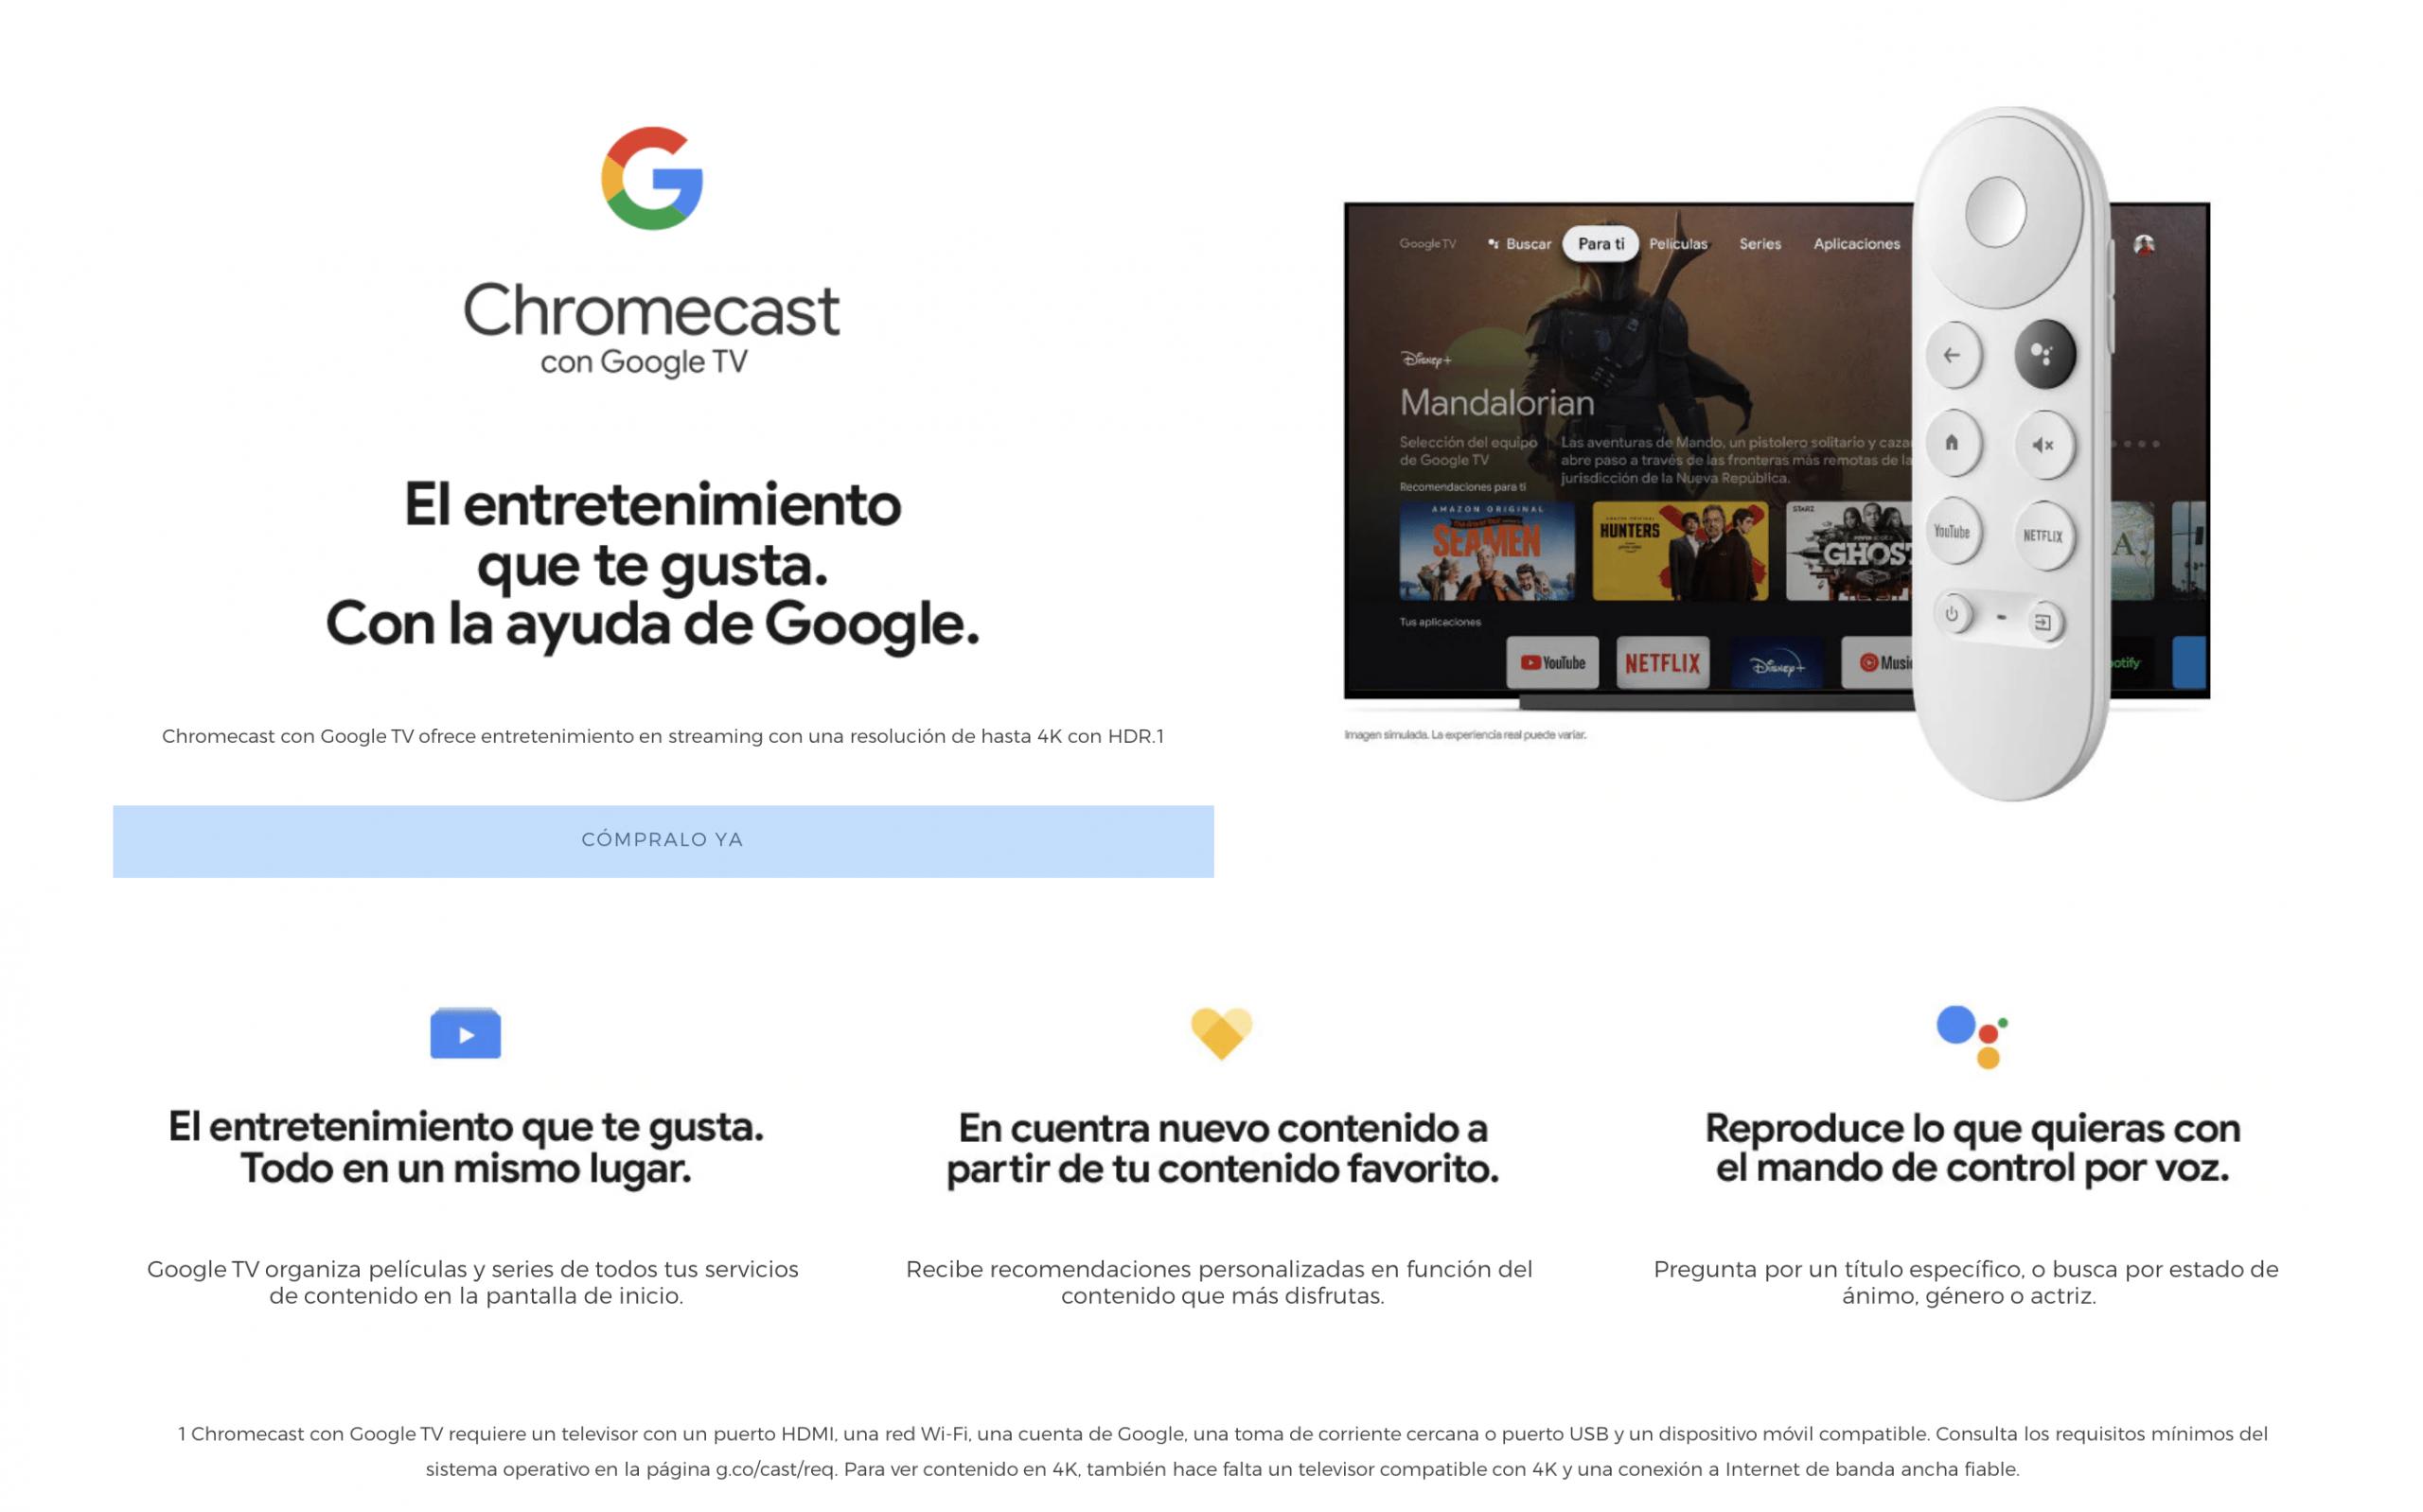 Chromecast con Google TV sin internet en casa